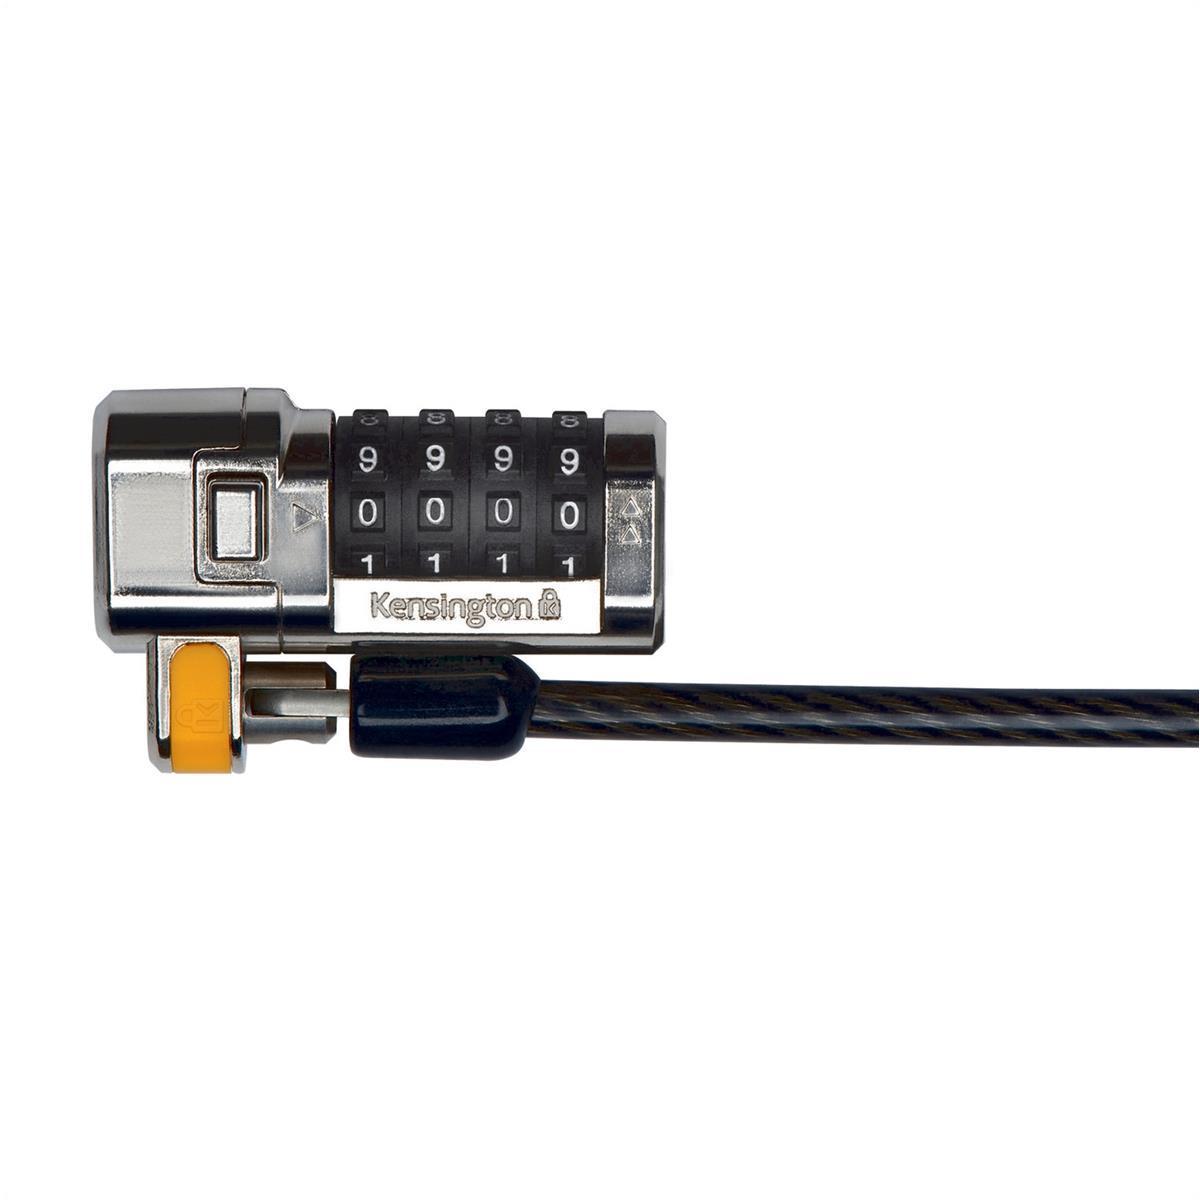 Kensington Ultra Laptop Combination Lock Resettable 10000 Combinations Cable 1800mm Ref K64697EU